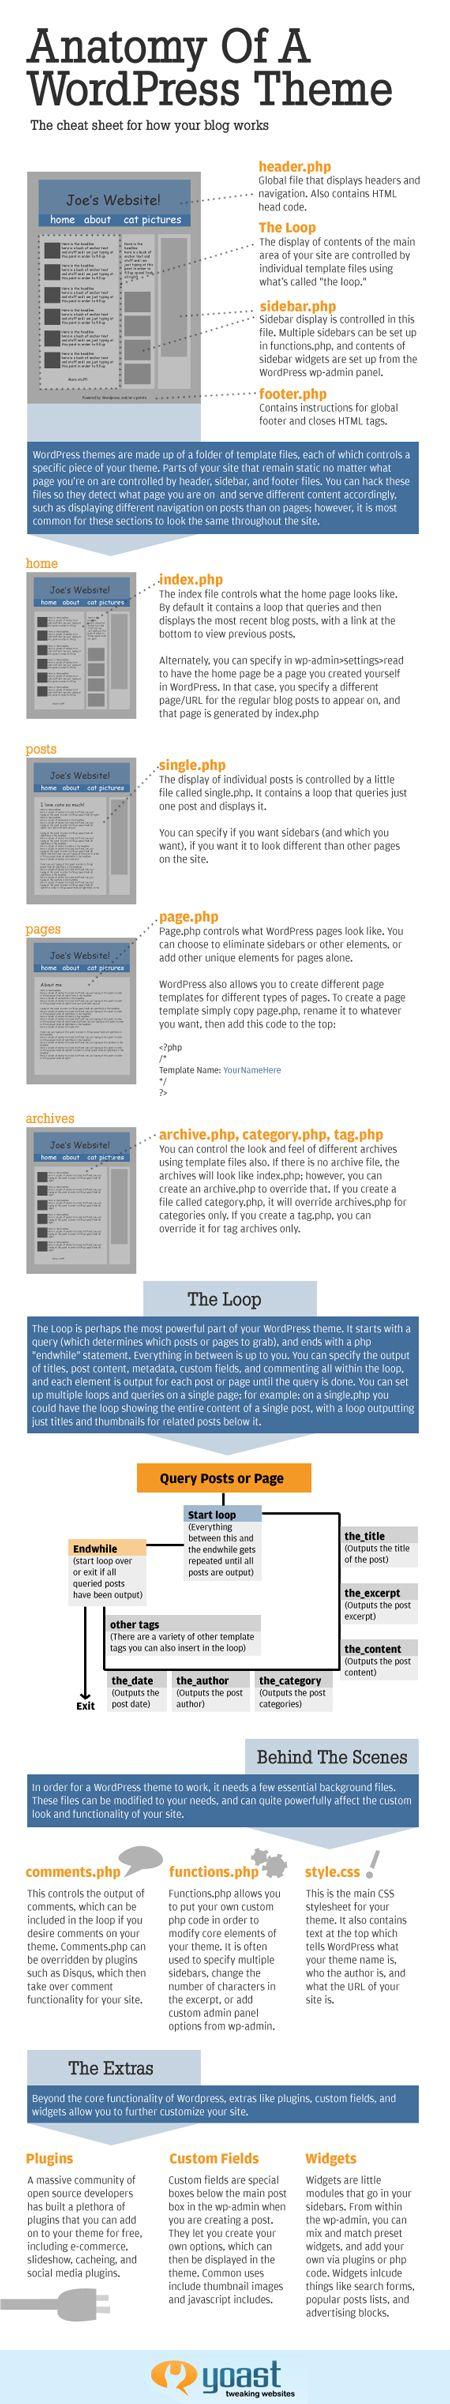 #Anatomy of a #Wordpress #theme -- a #cheatsheet for how your Wordpress blog works